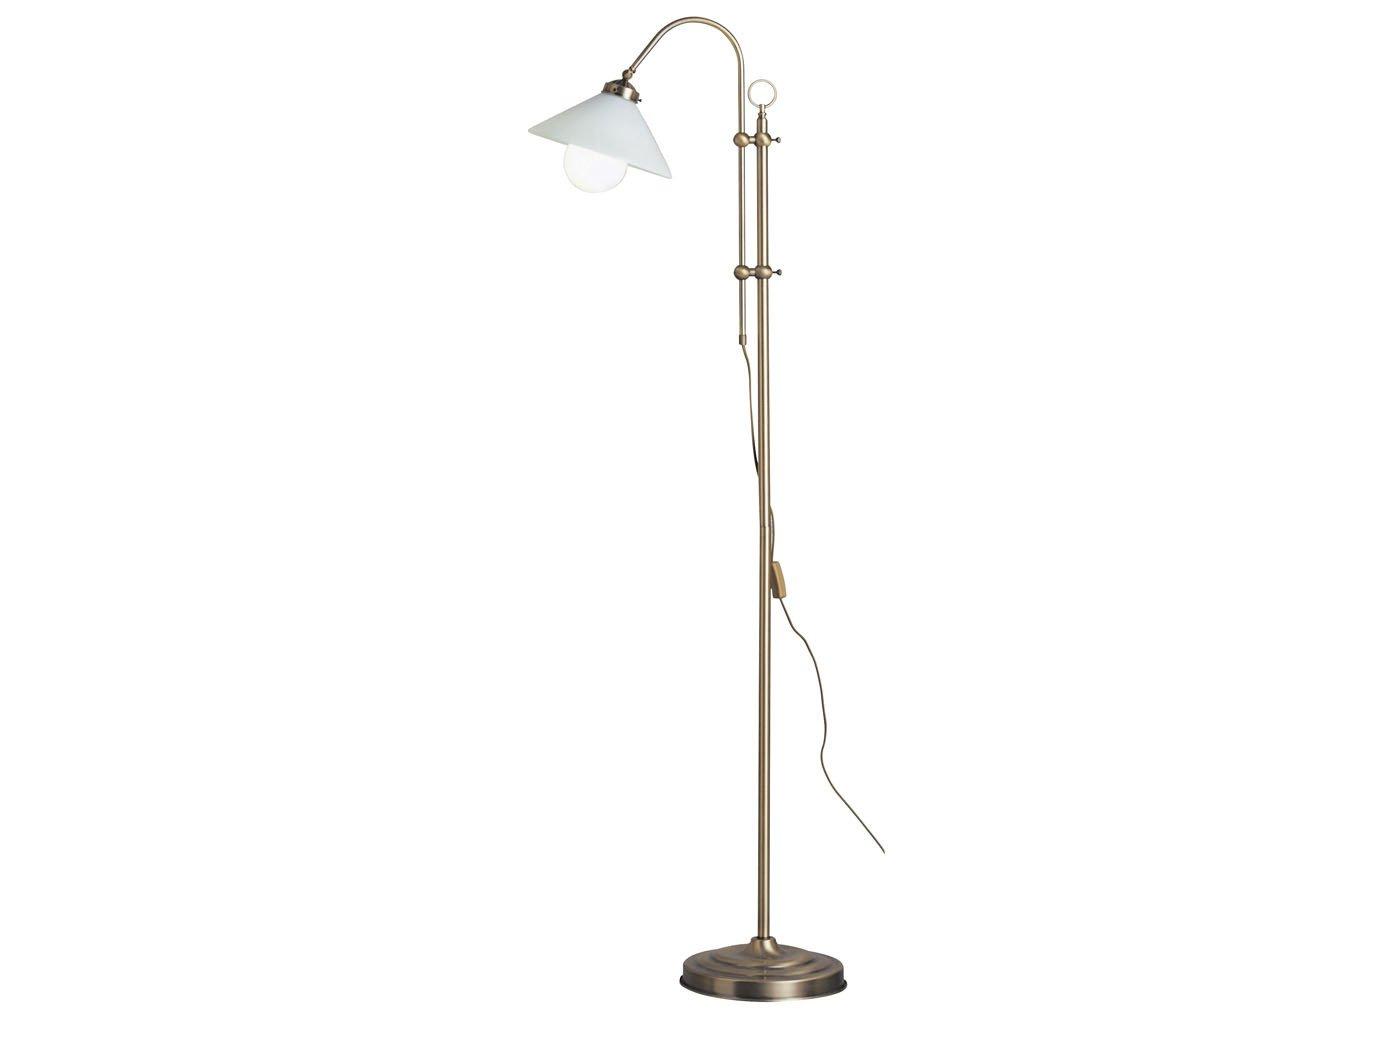 Hohenverstellbare Led Stehlampe Landlife In Altmessing